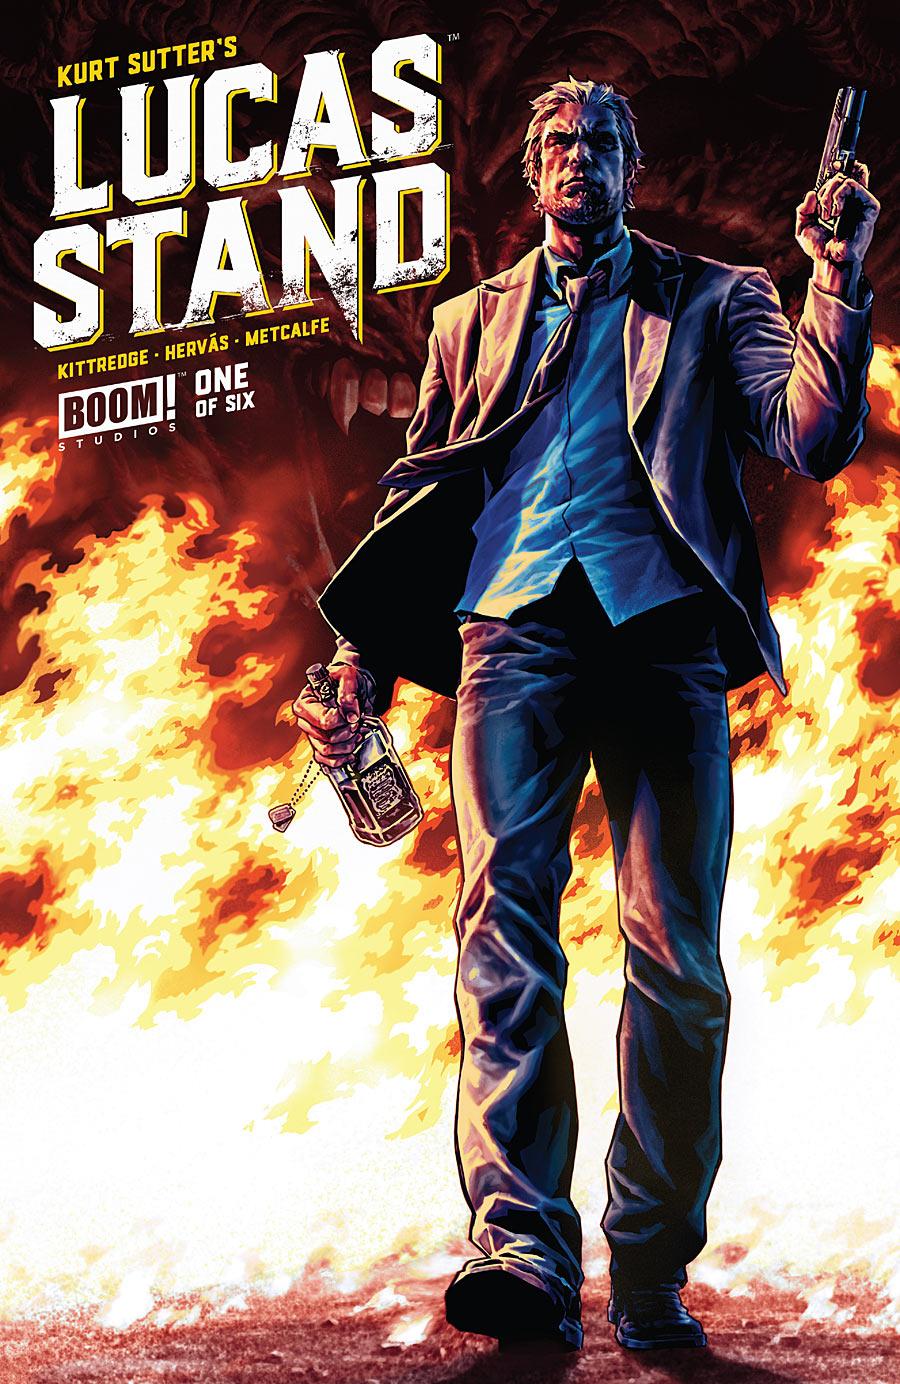 Lucas Stand - Kurt Sutter, Caitlin Kittredge (W), Jesus Hervas (A) • Boom! Studios